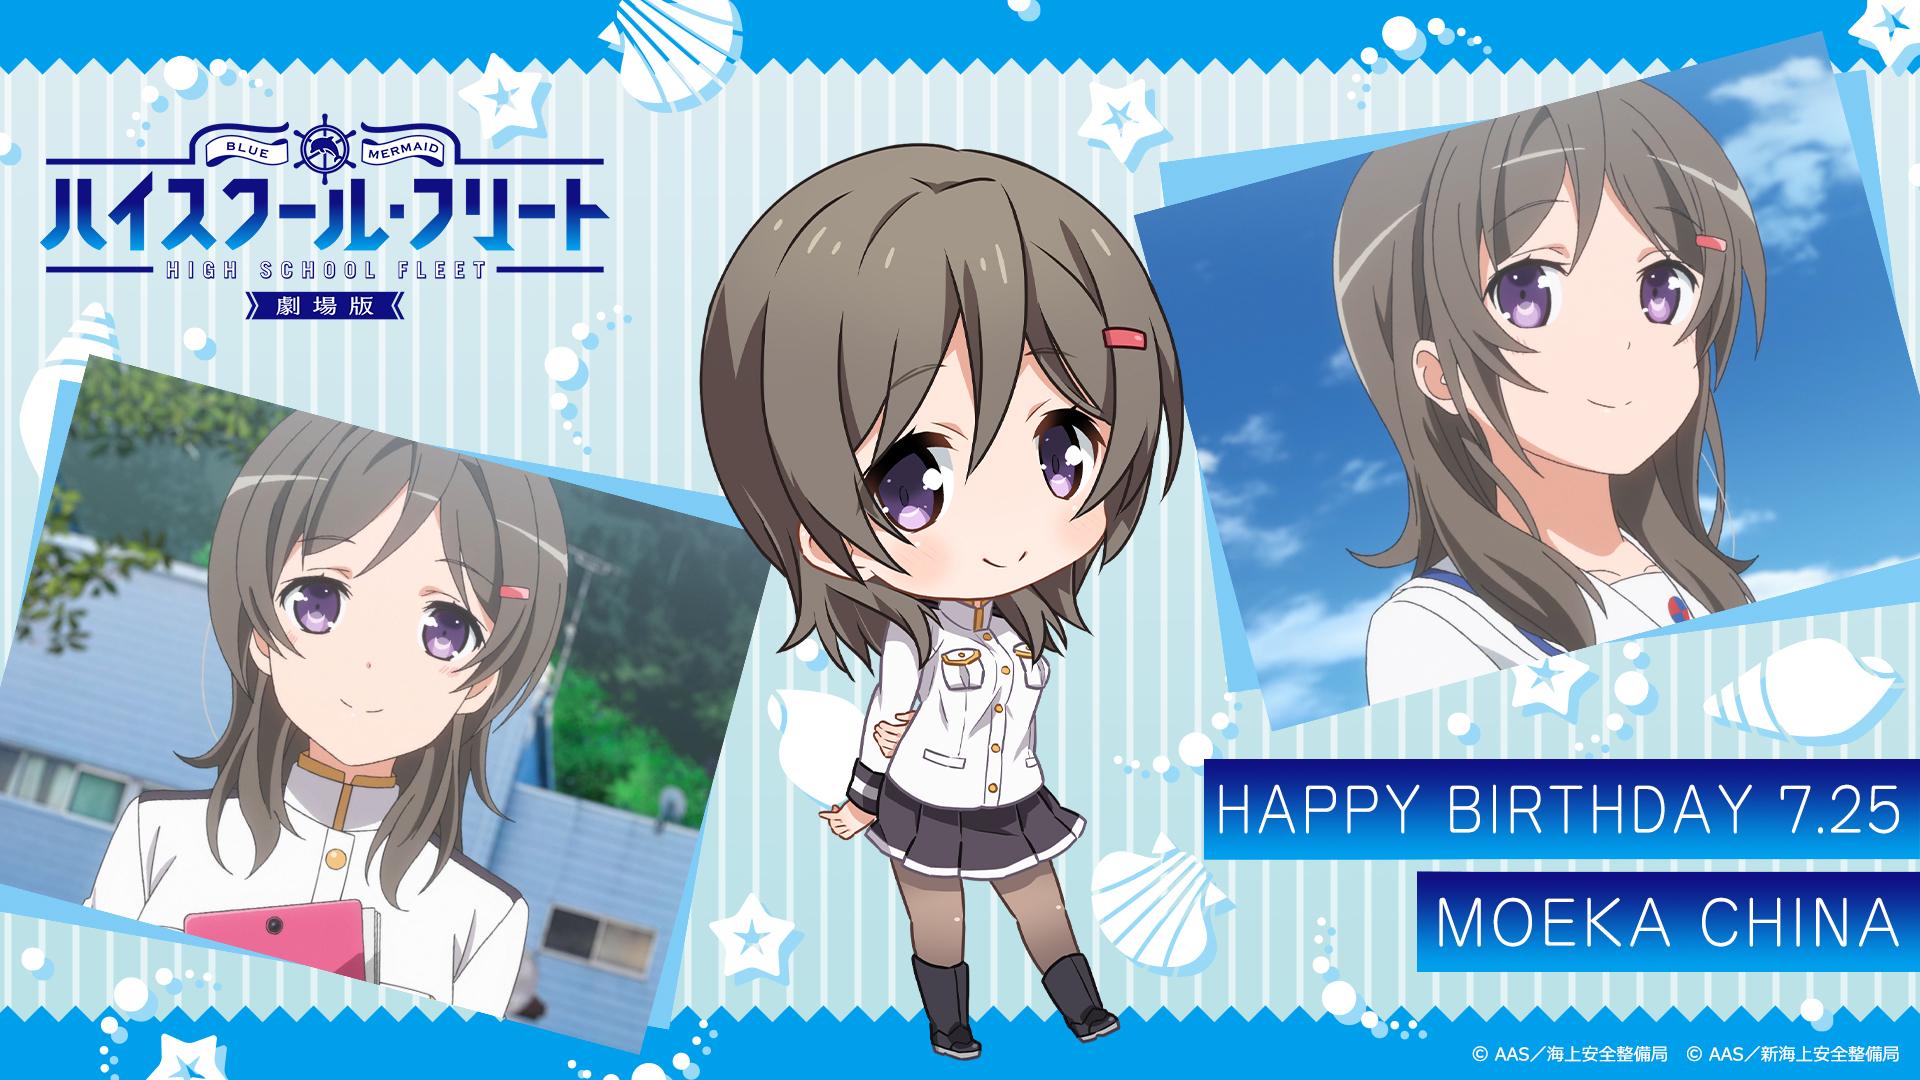 Happy Birthday Special 劇場版 ハイスクール フリート 公式